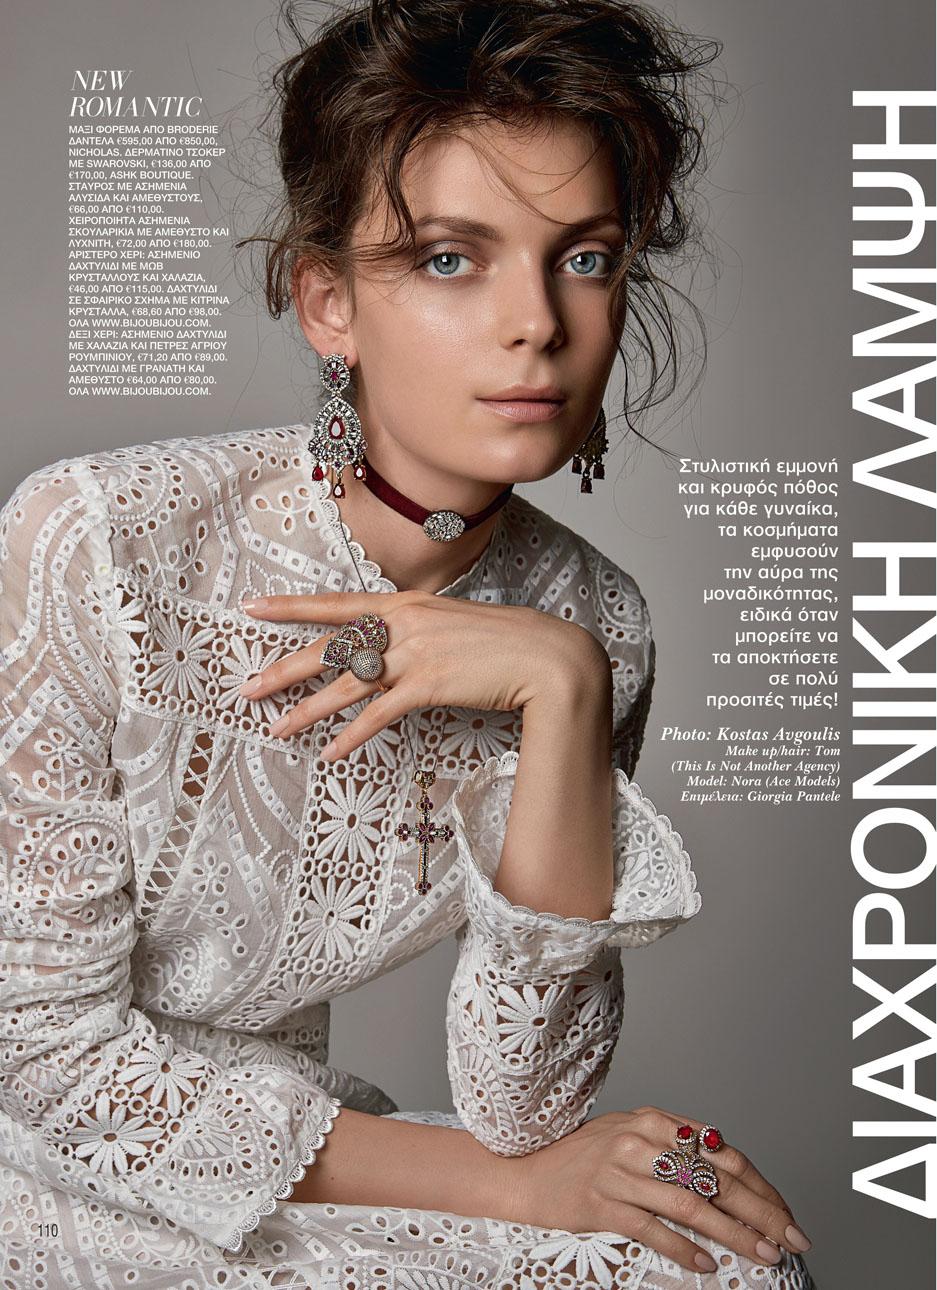 New Romantics : the era of Nora for Hello Mag.